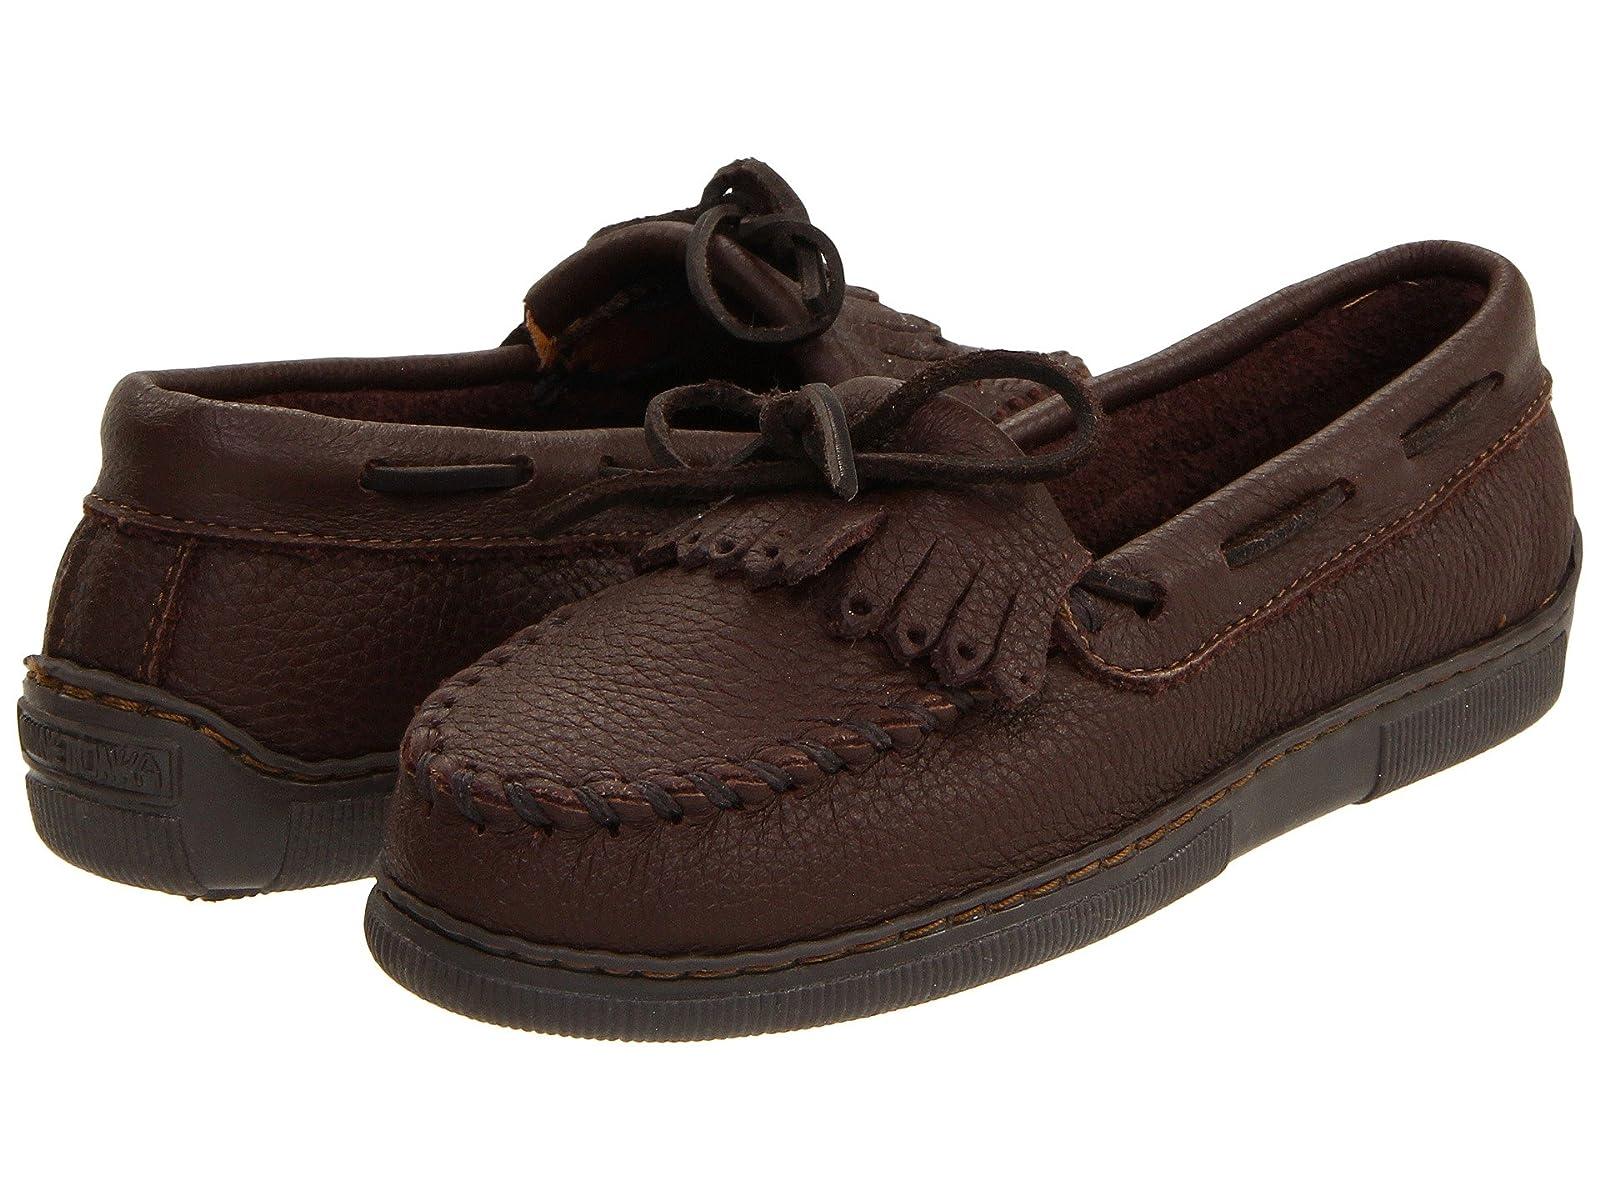 Minnetonka Moosehide Fringed KiltyAtmospheric grades have affordable shoes